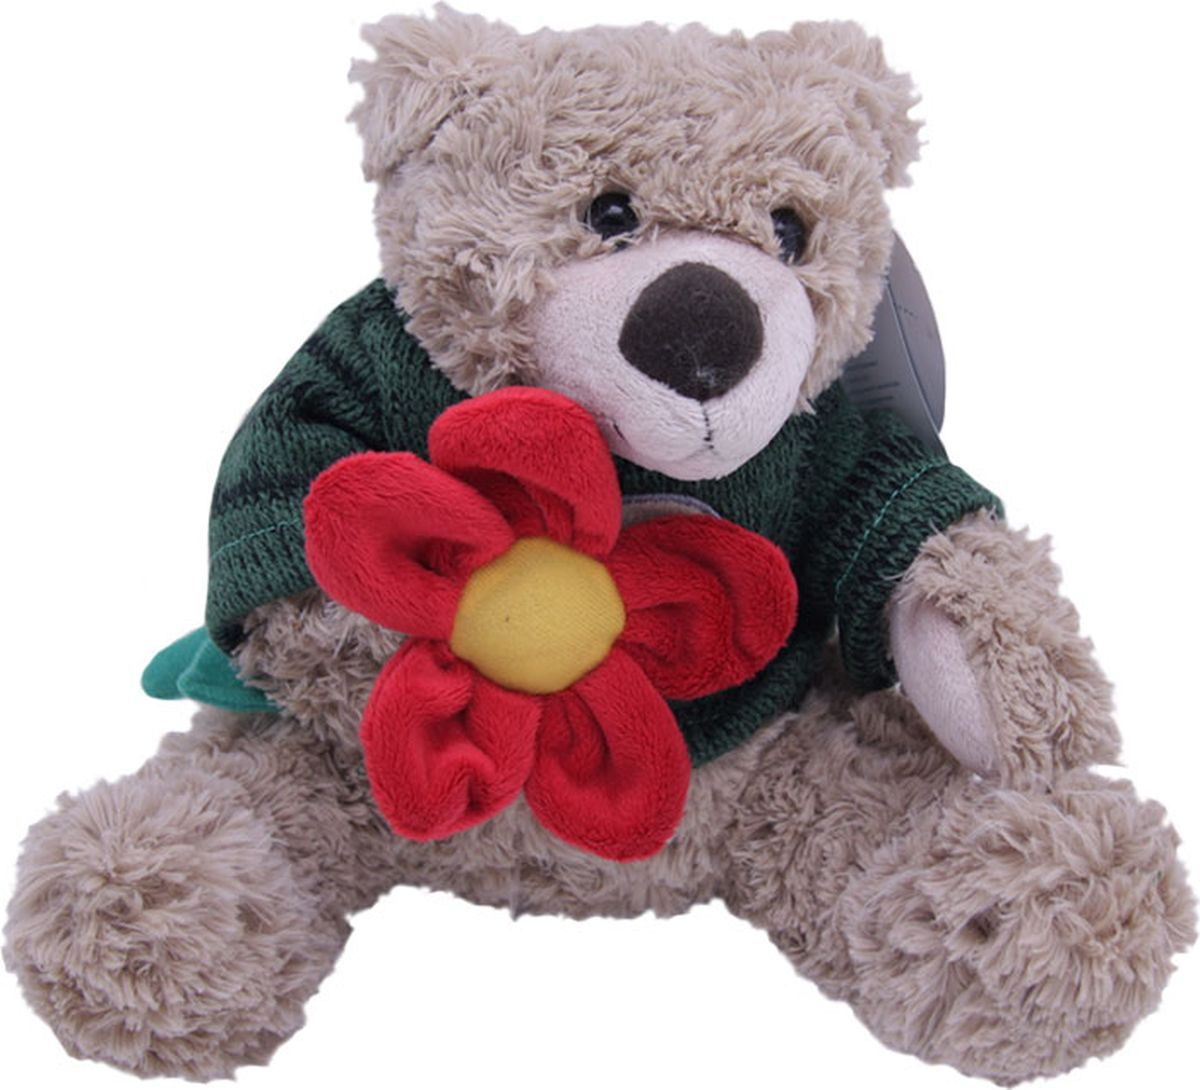 Magic Bear Toys Мягкая игрушка Мишка Тед в свитере c цветком 20 см - Мягкие игрушки